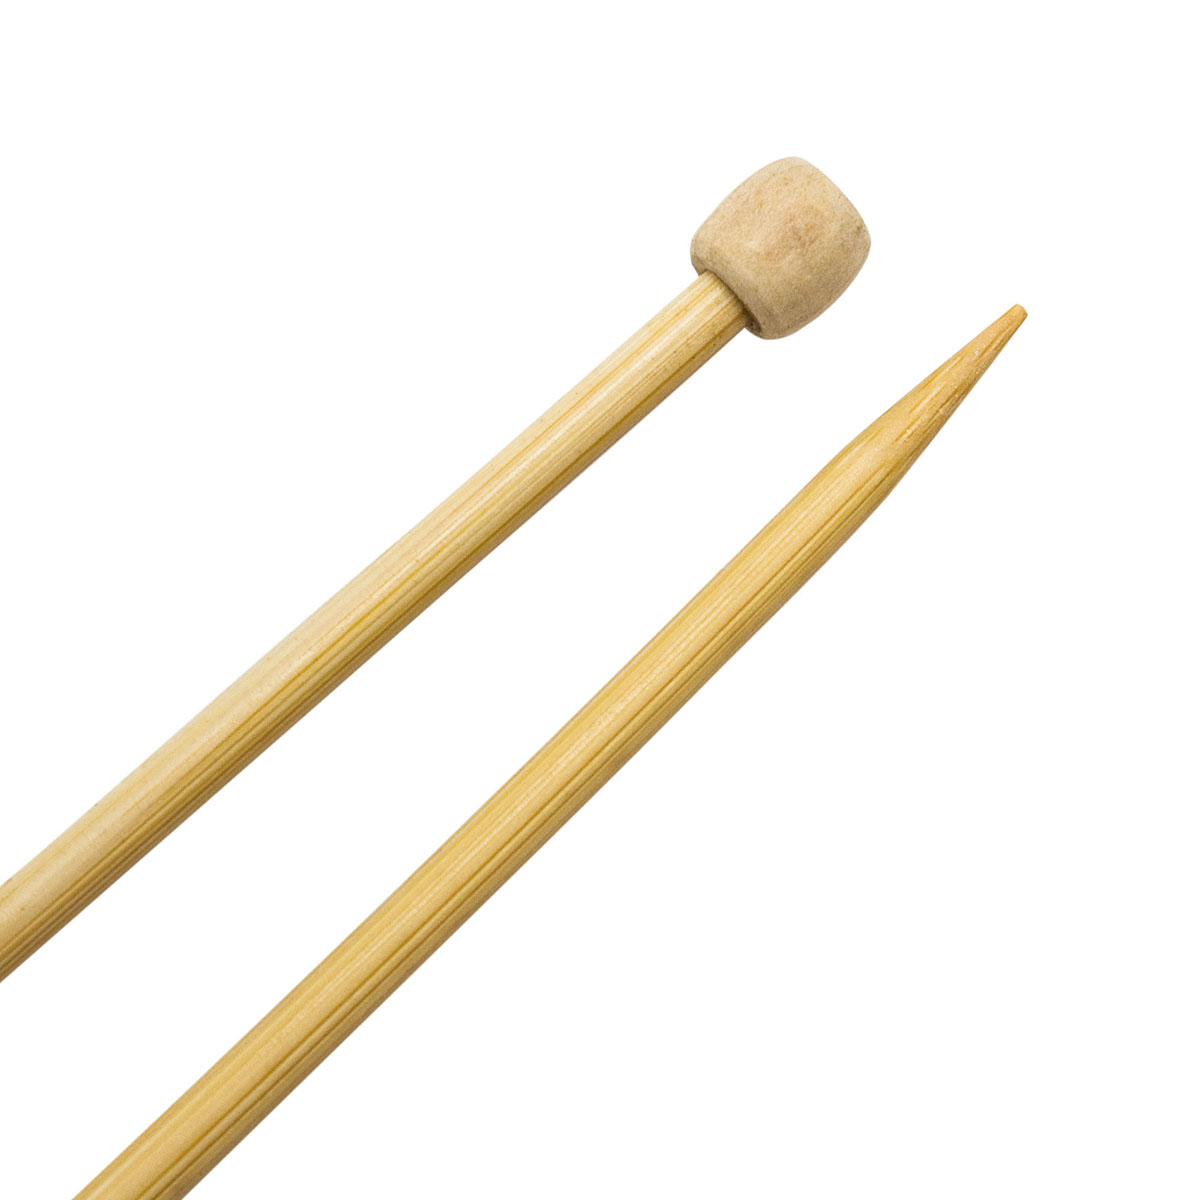 Спицы прямые бамбук 942250, 35 см, 5,0 мм, Hobby&Pro